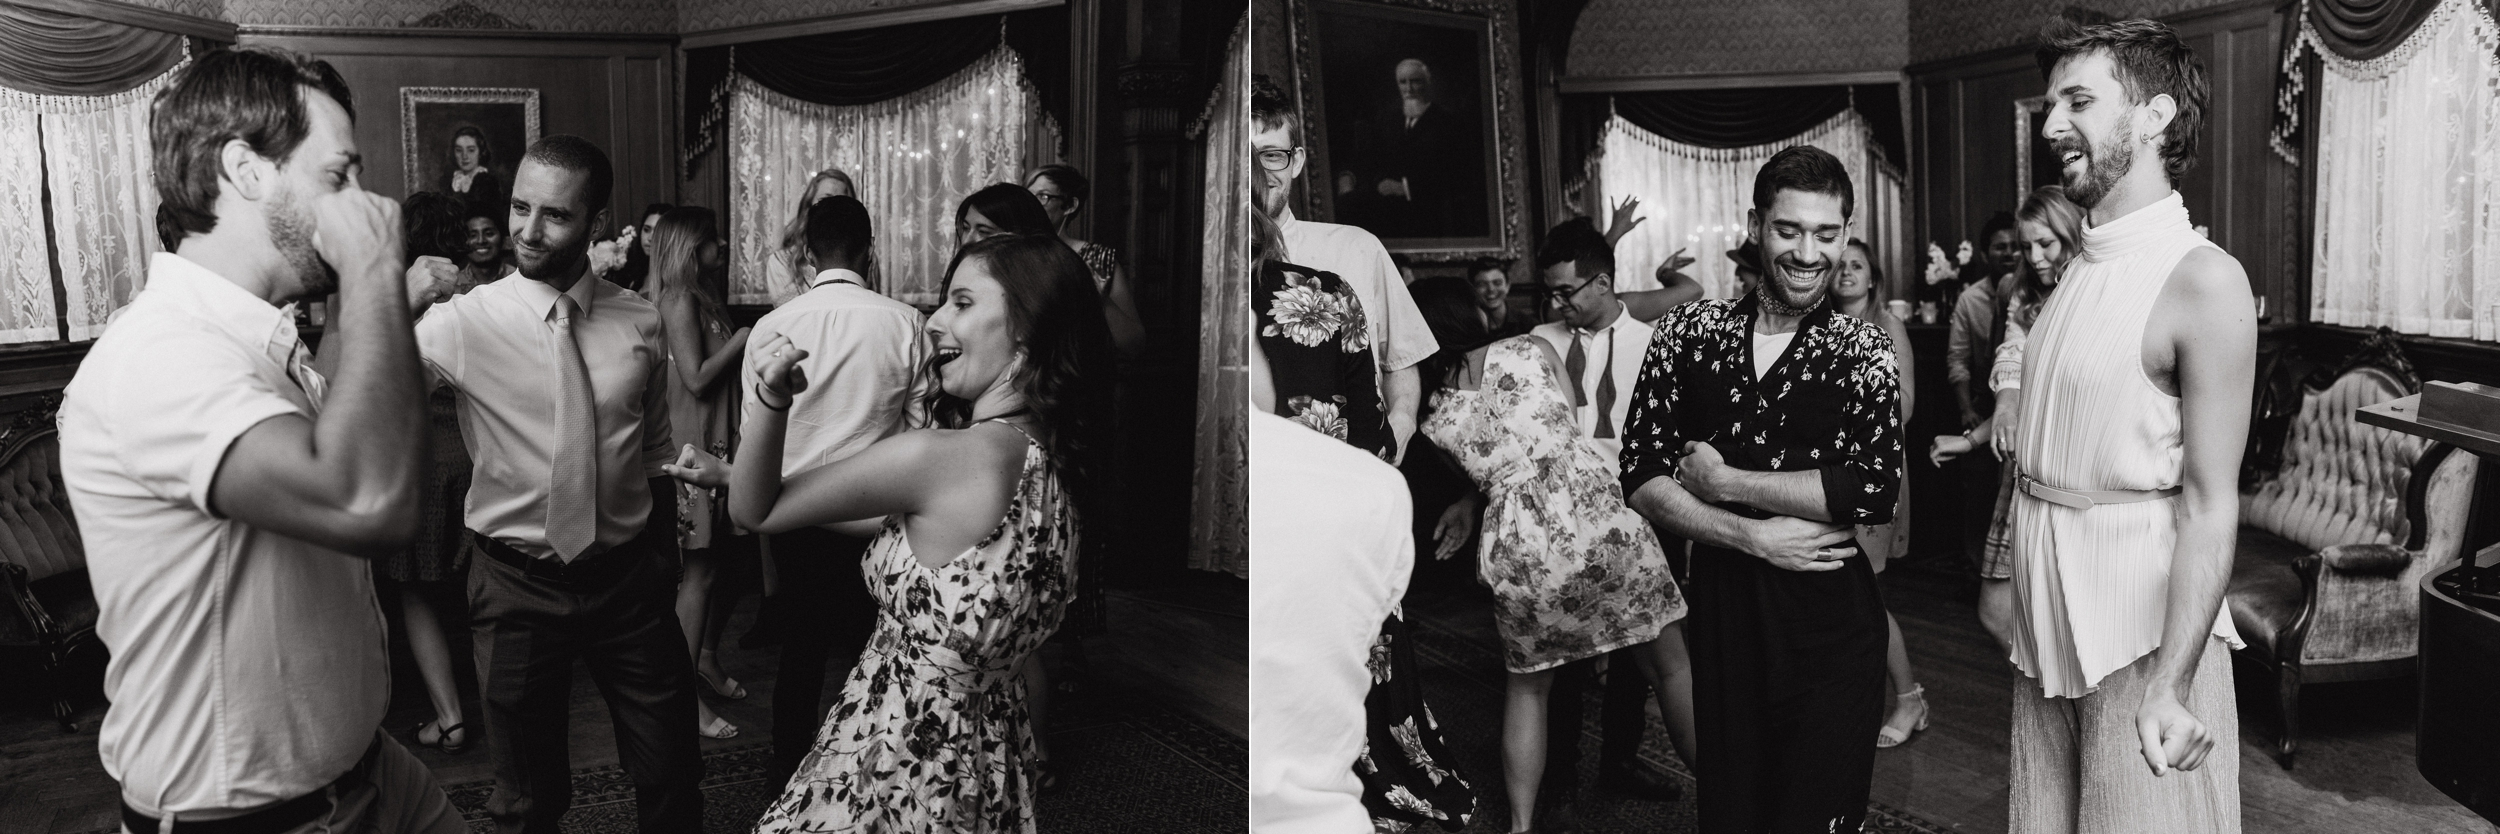 098-lgbtq-falkirk-cultural-center-wedding-photographer-vivianchen-864_WEB.jpg